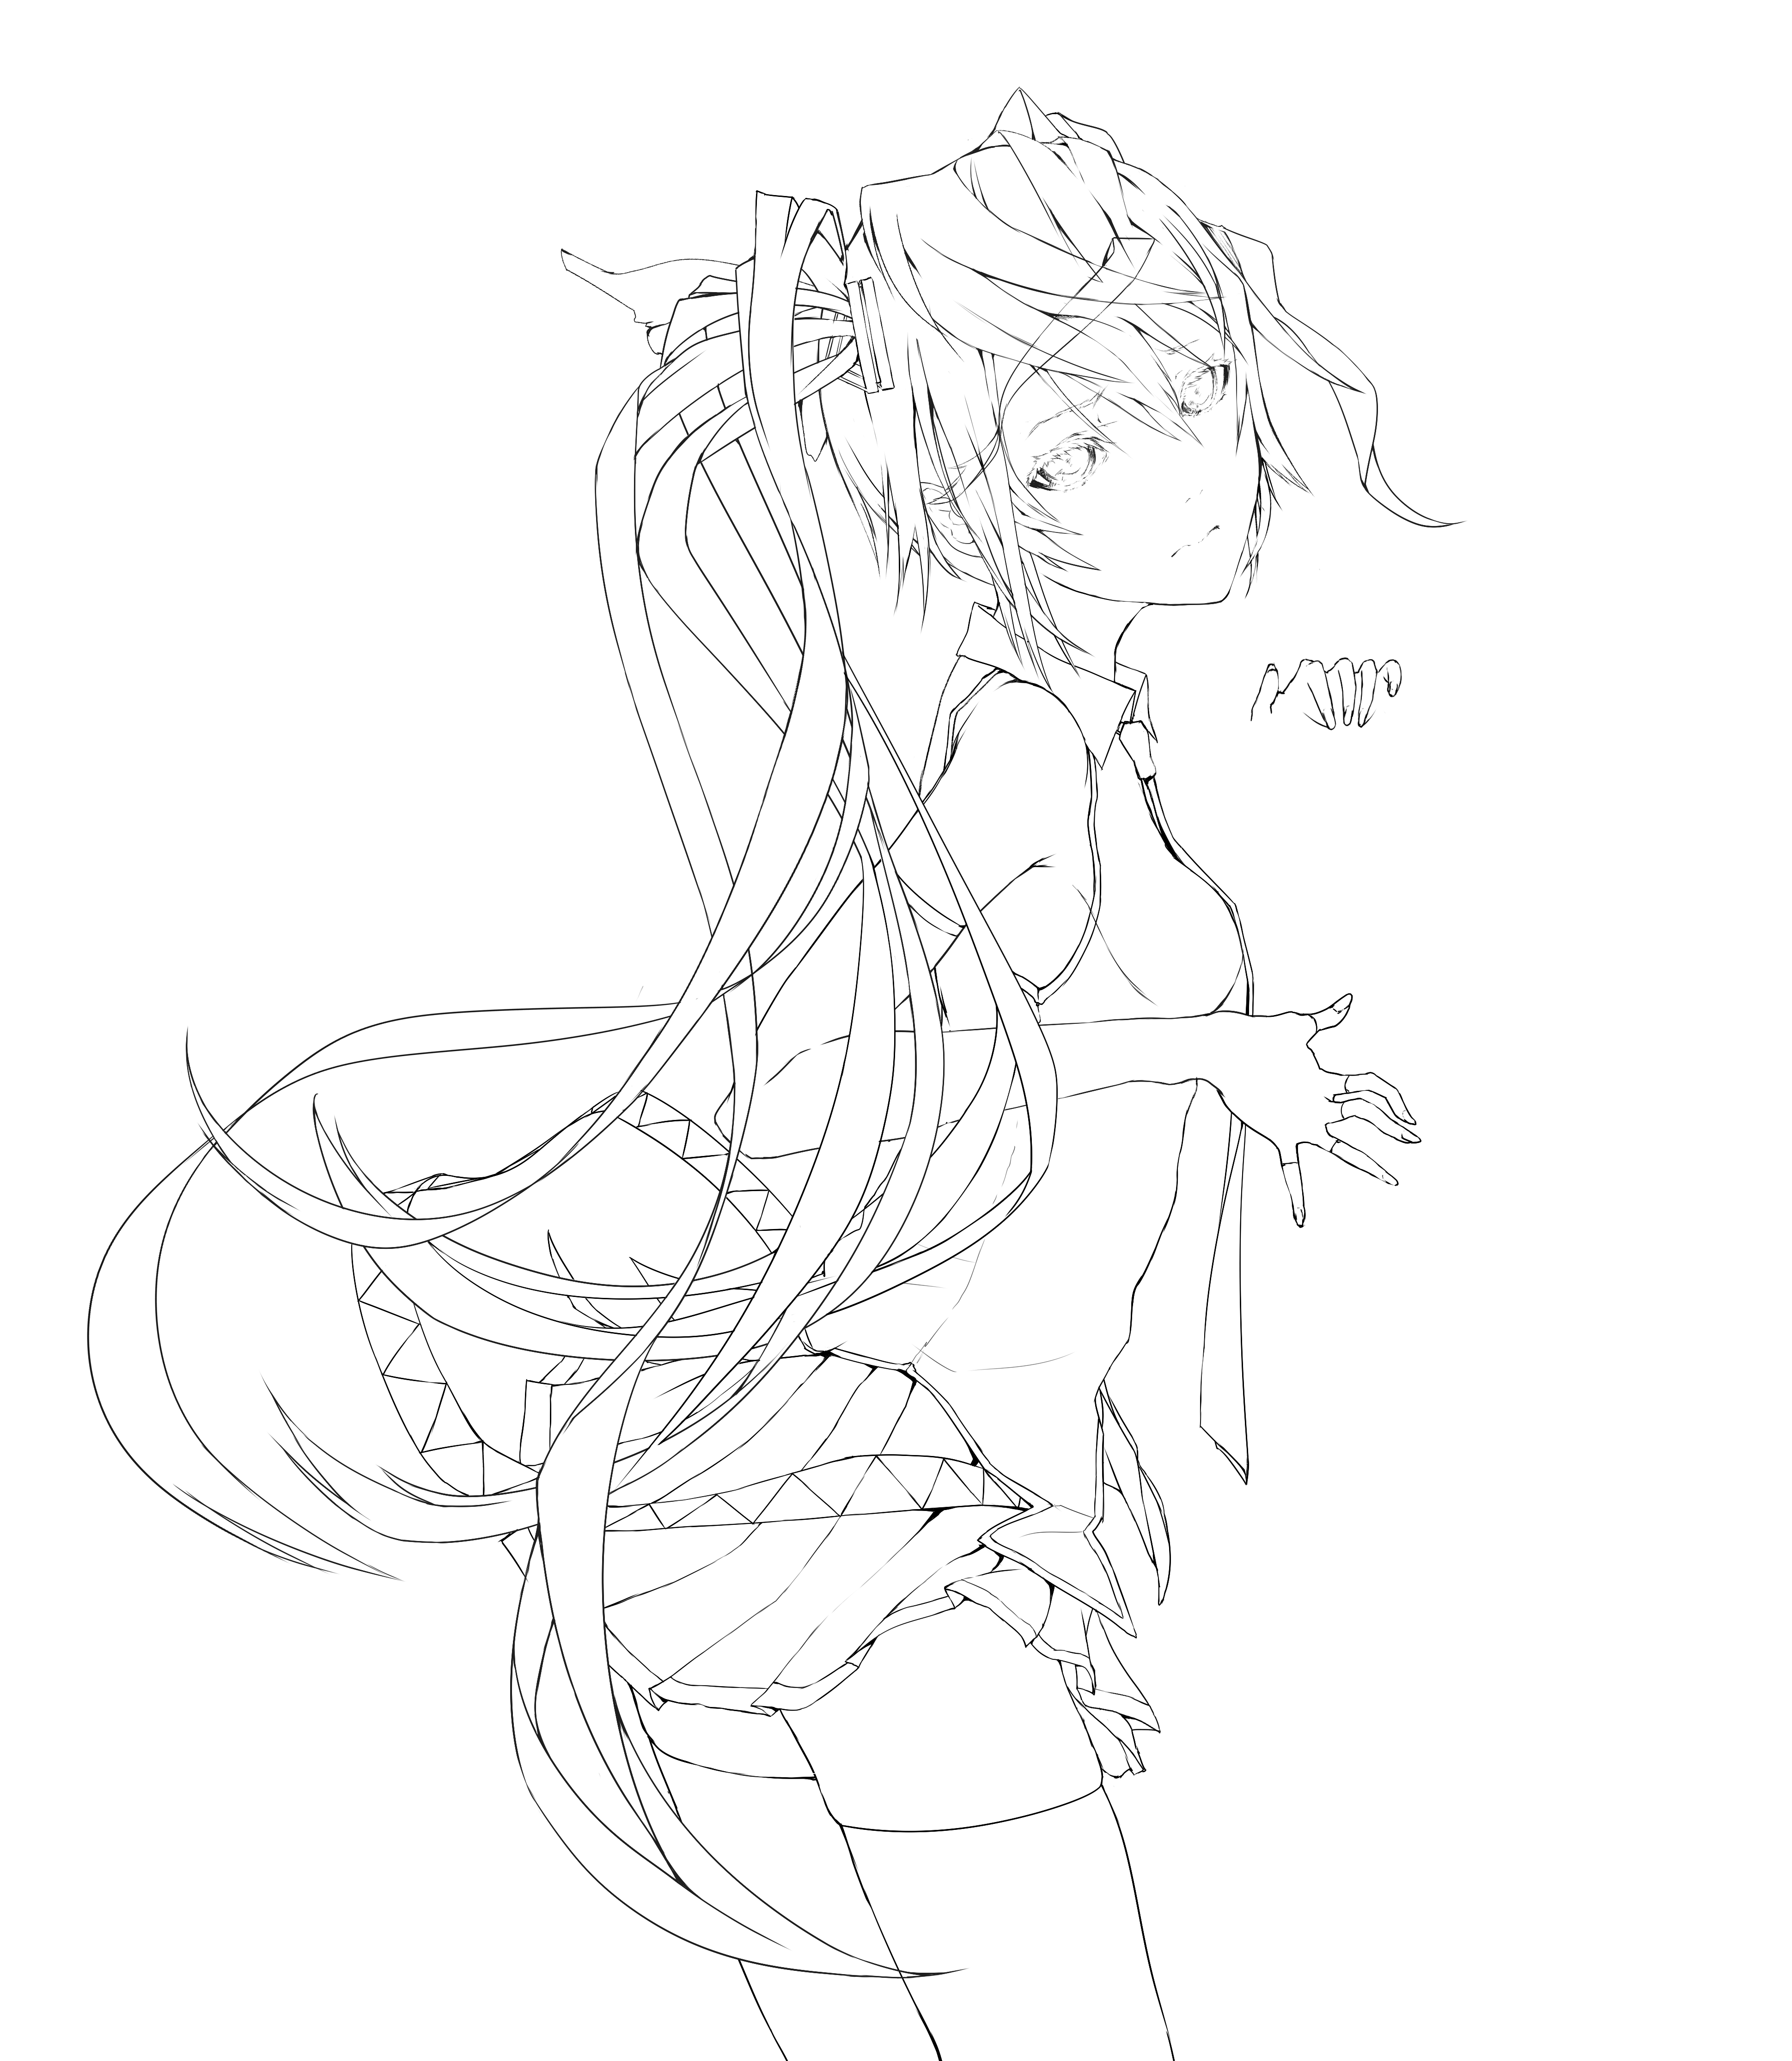 Zerochan Lineart : Hatsune miku  zerochan